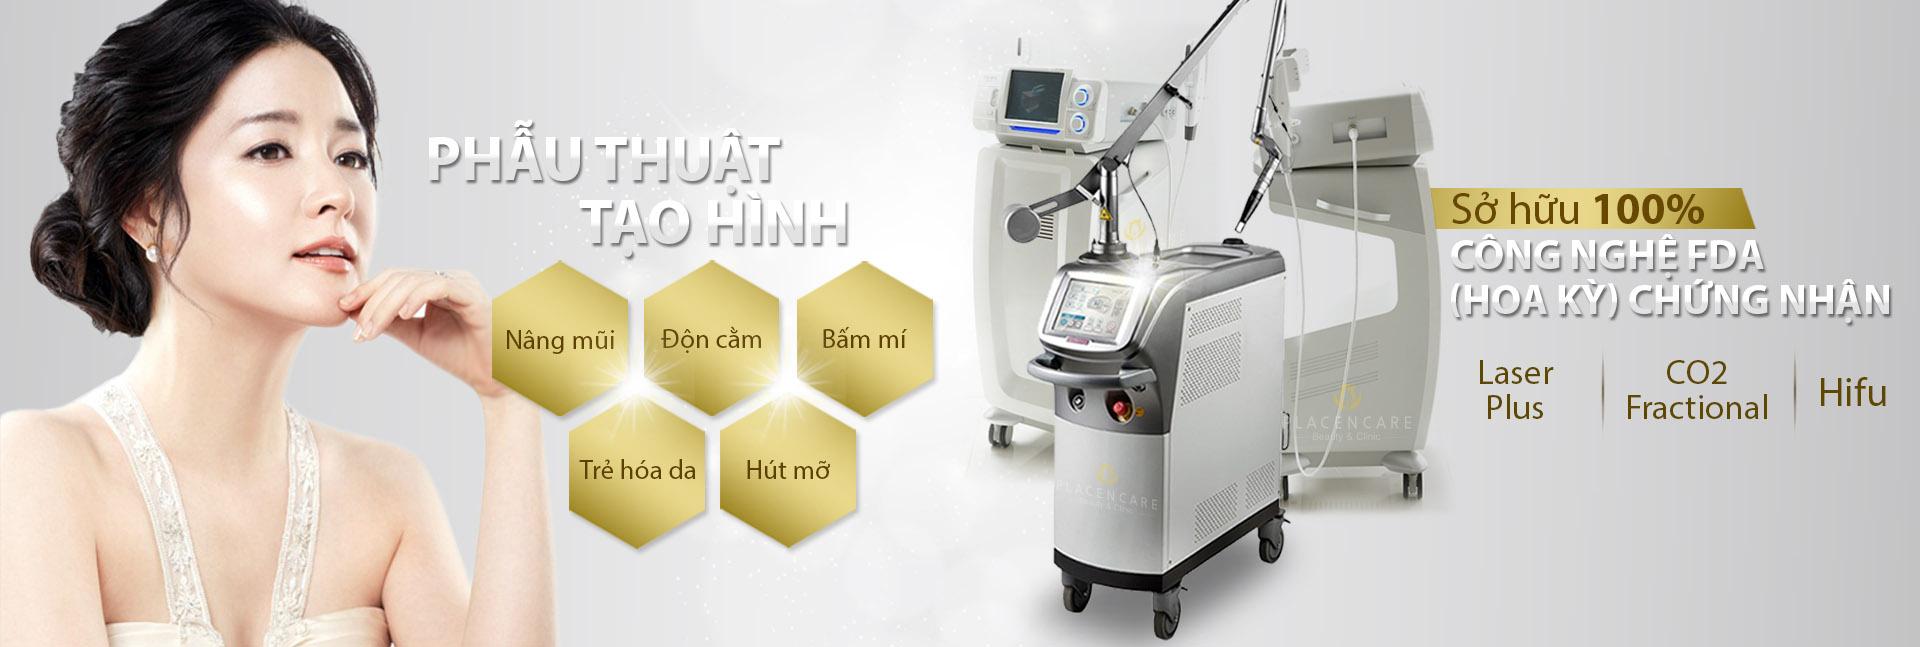 Phau-thuat-tao-hinh-CN-FDA-Slide2